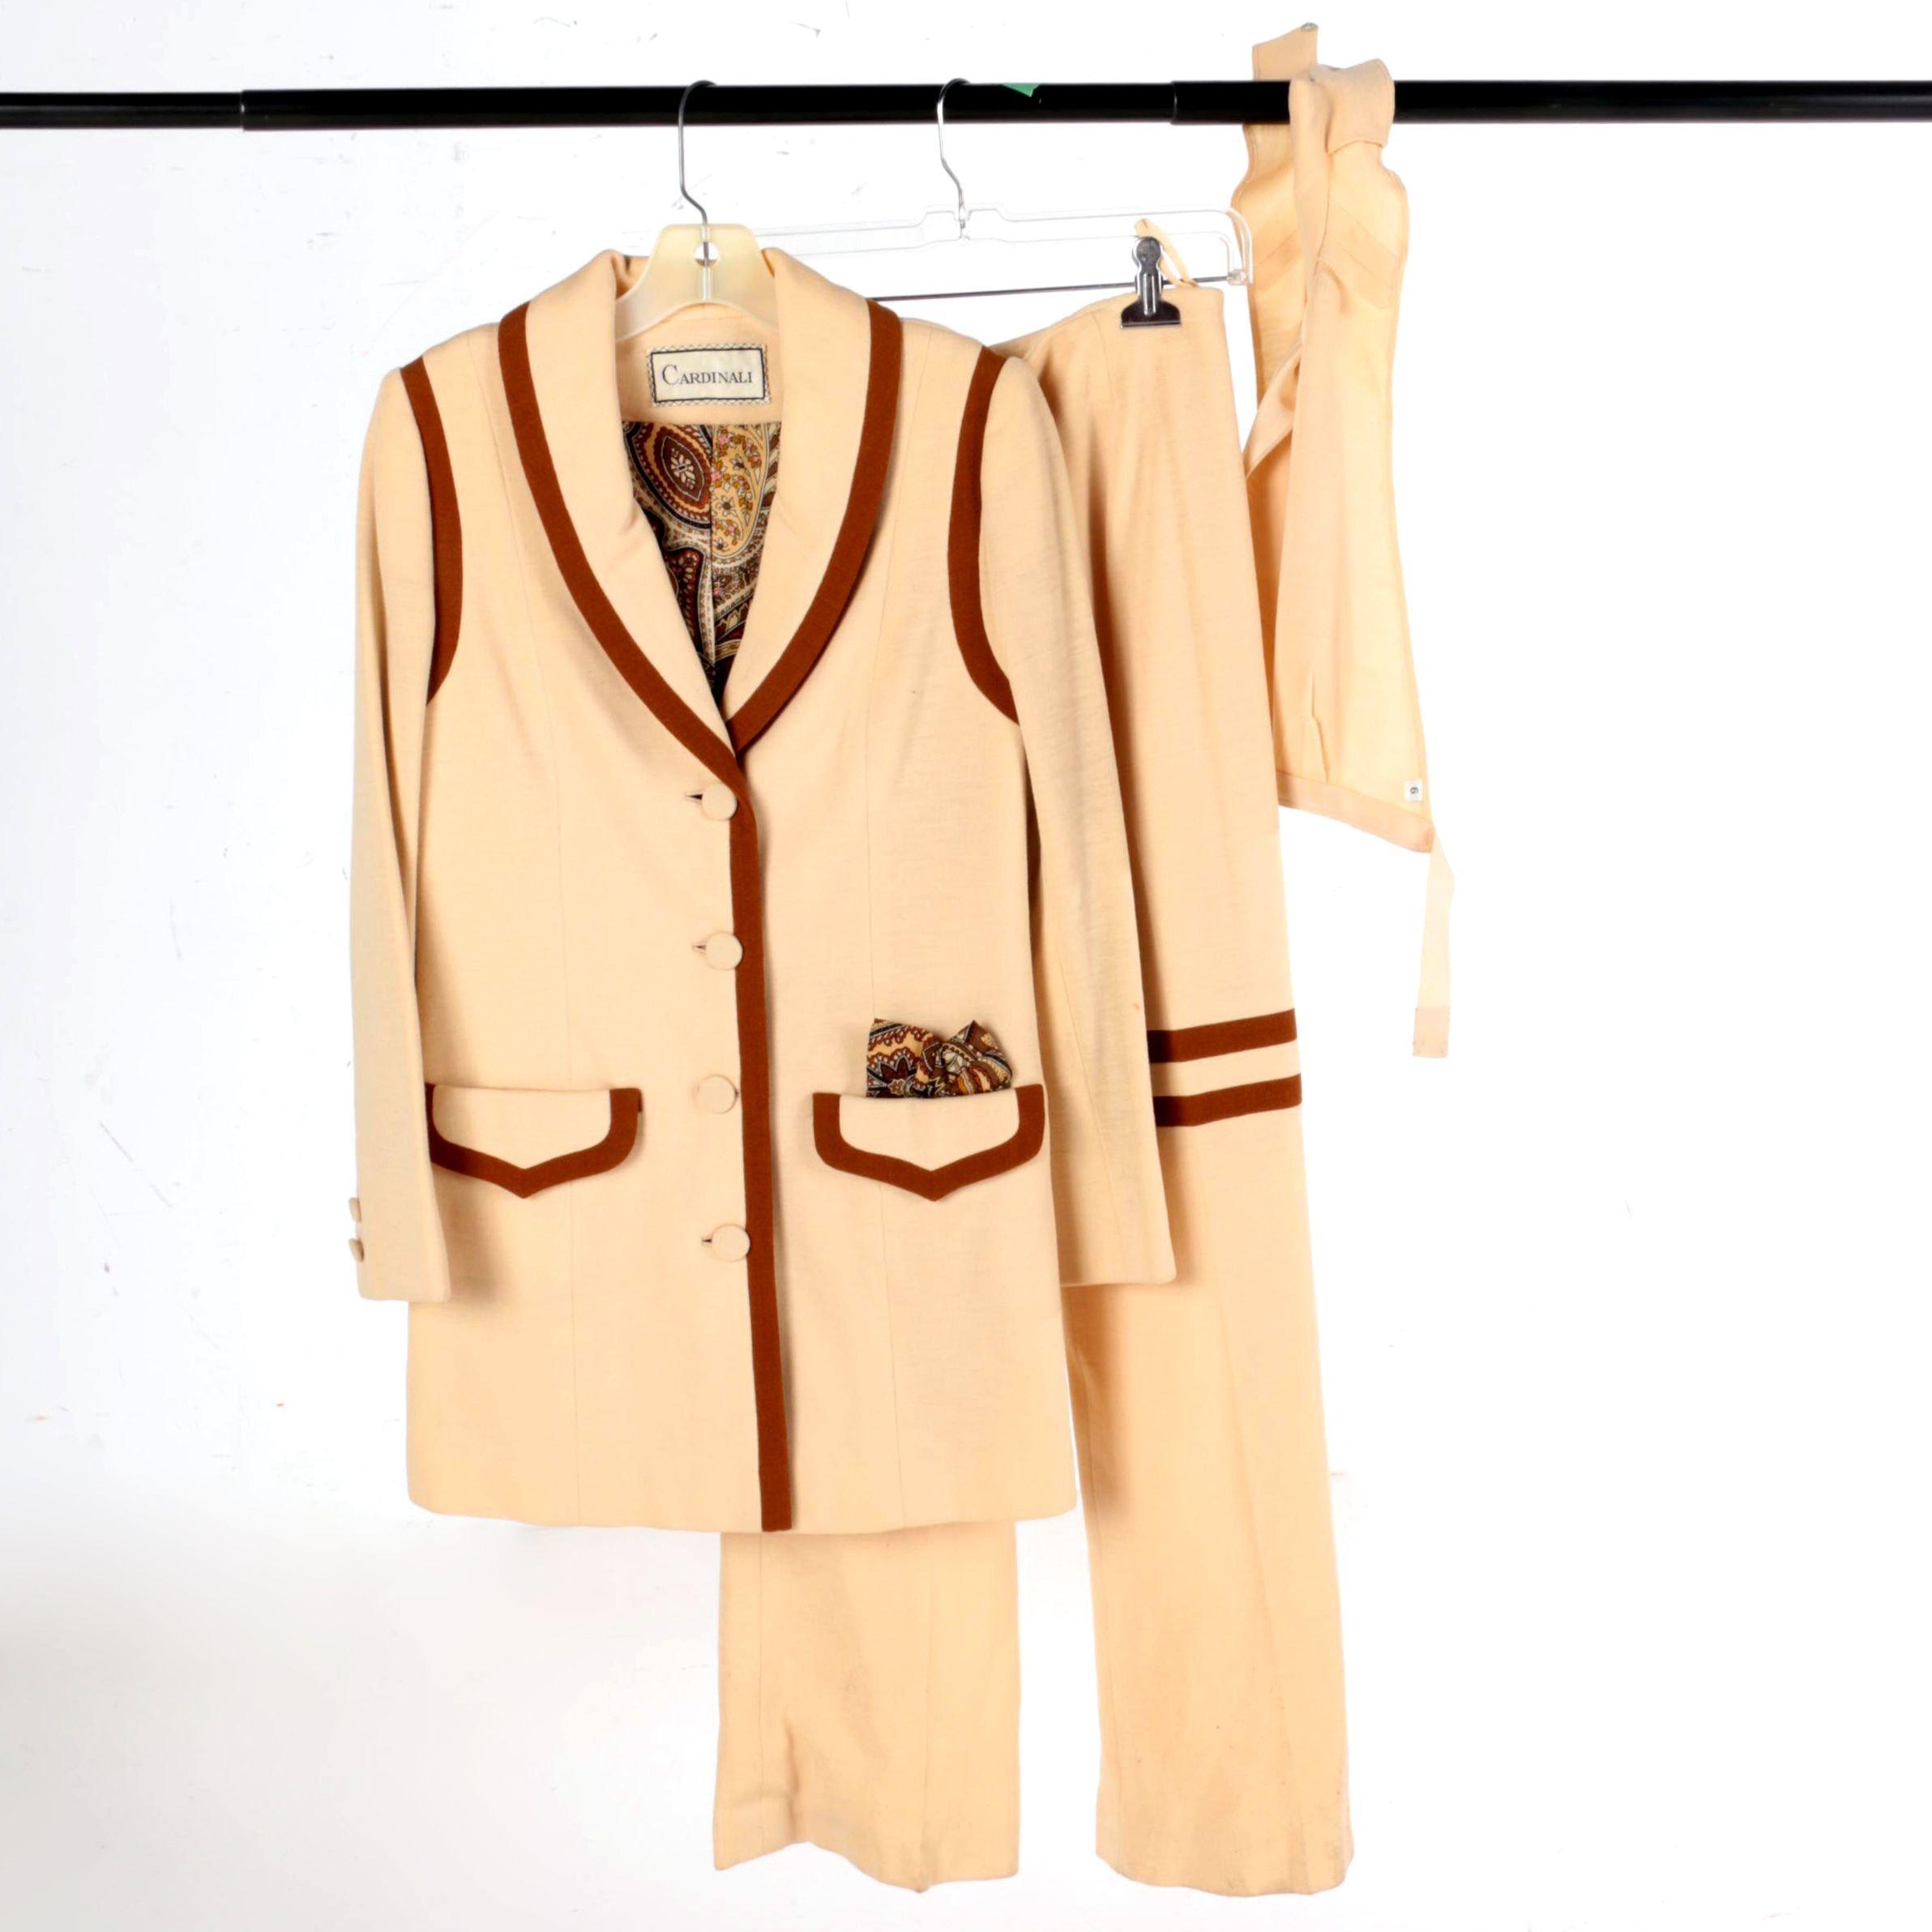 Women's Vintage Cardinali Three-Piece Pantsuit